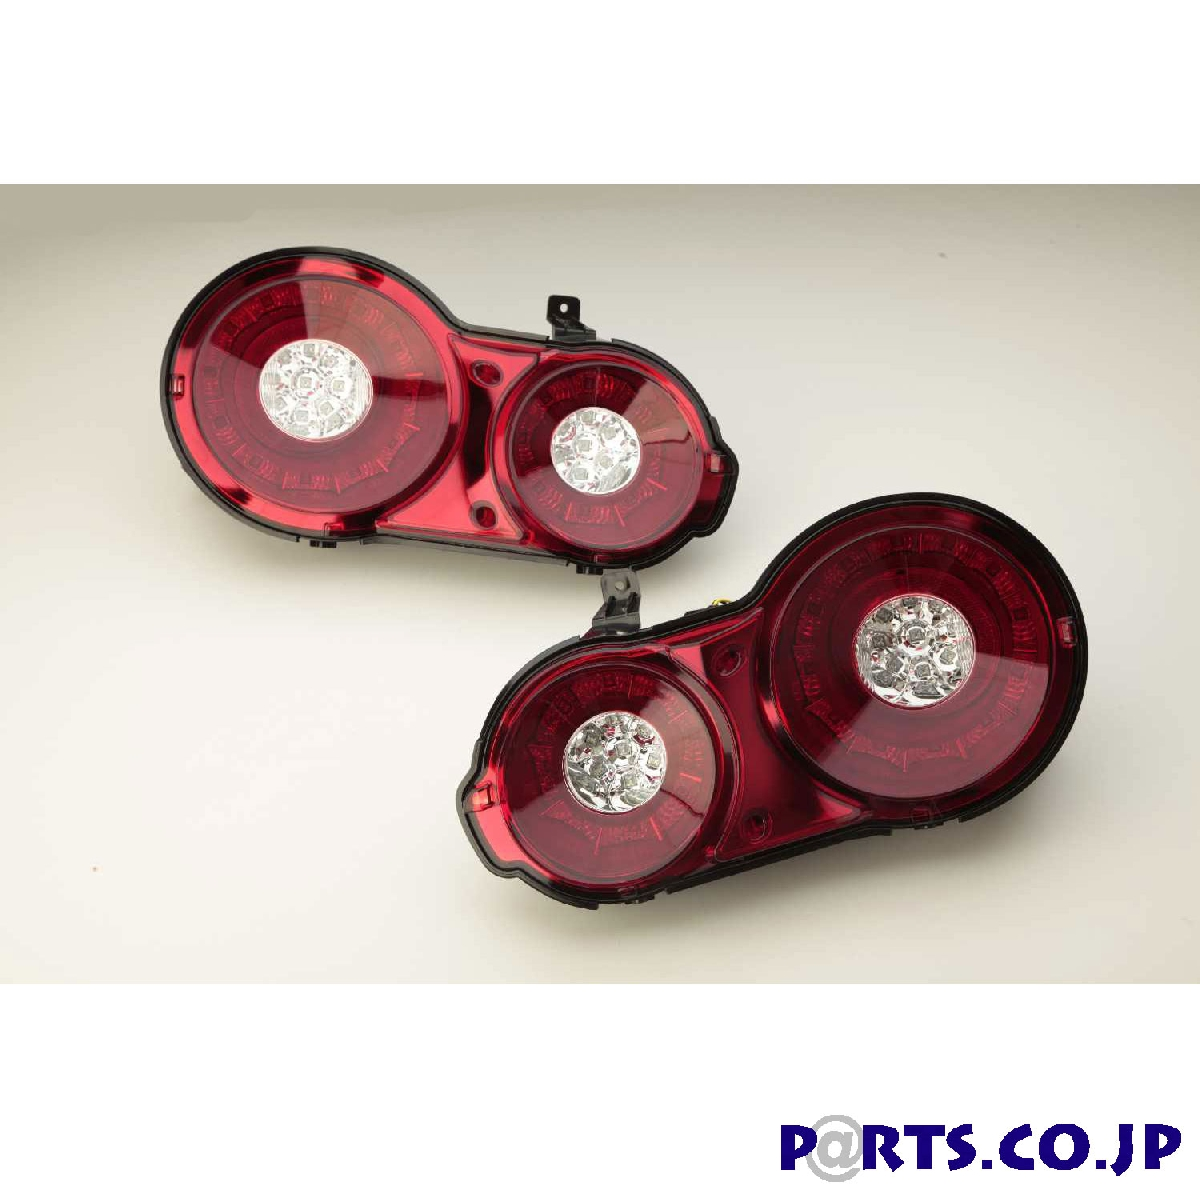 SONAR(ソナー) テールライト 日産 GT-R LED テールライト レッド ニッサン GT-R R35 2007~ オールモデル